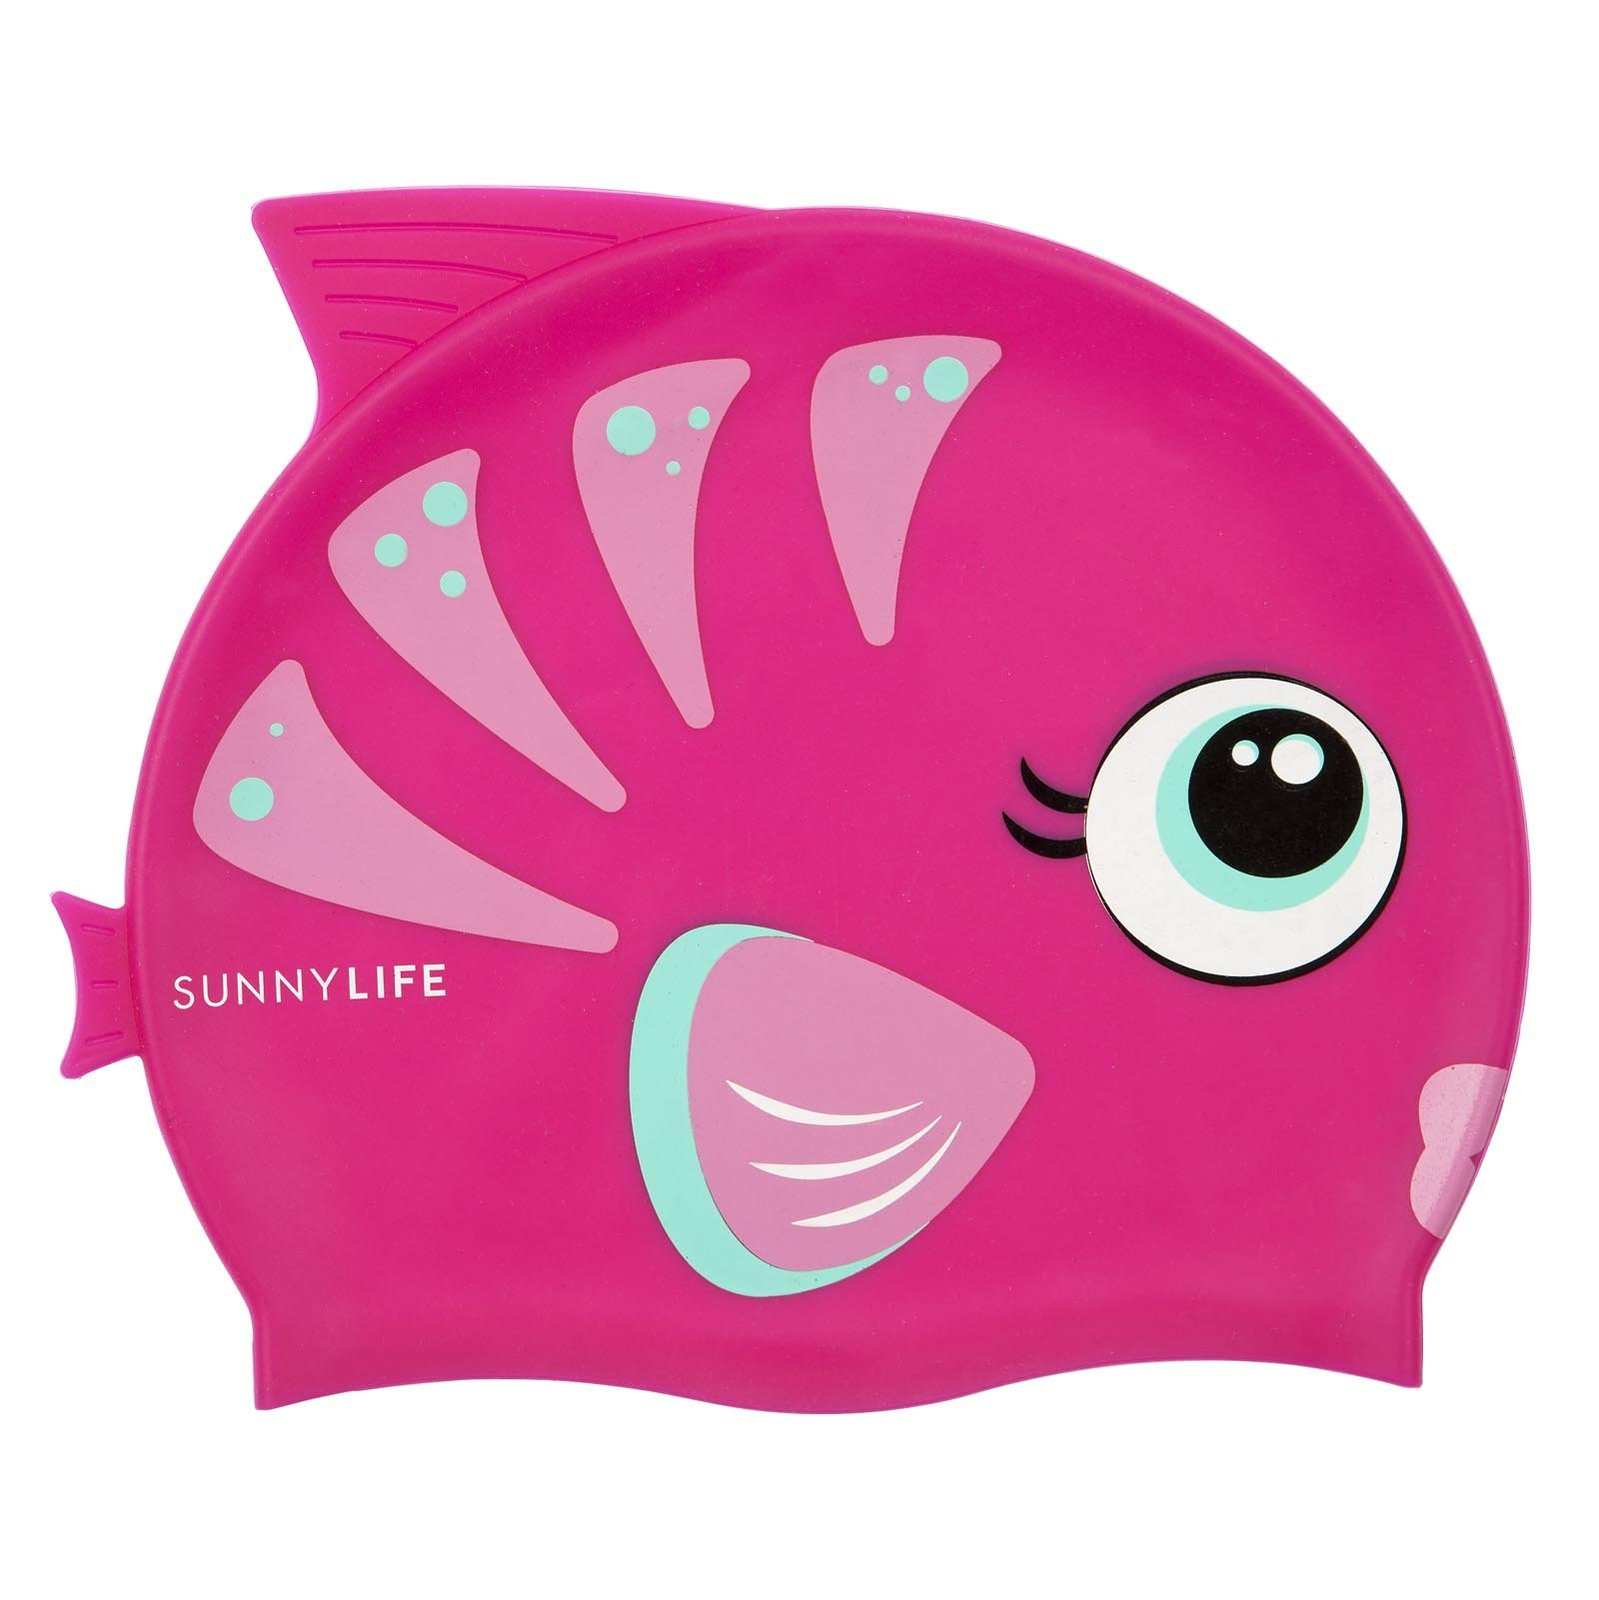 Sunnylife Swimming Cap - Fishy Pink image